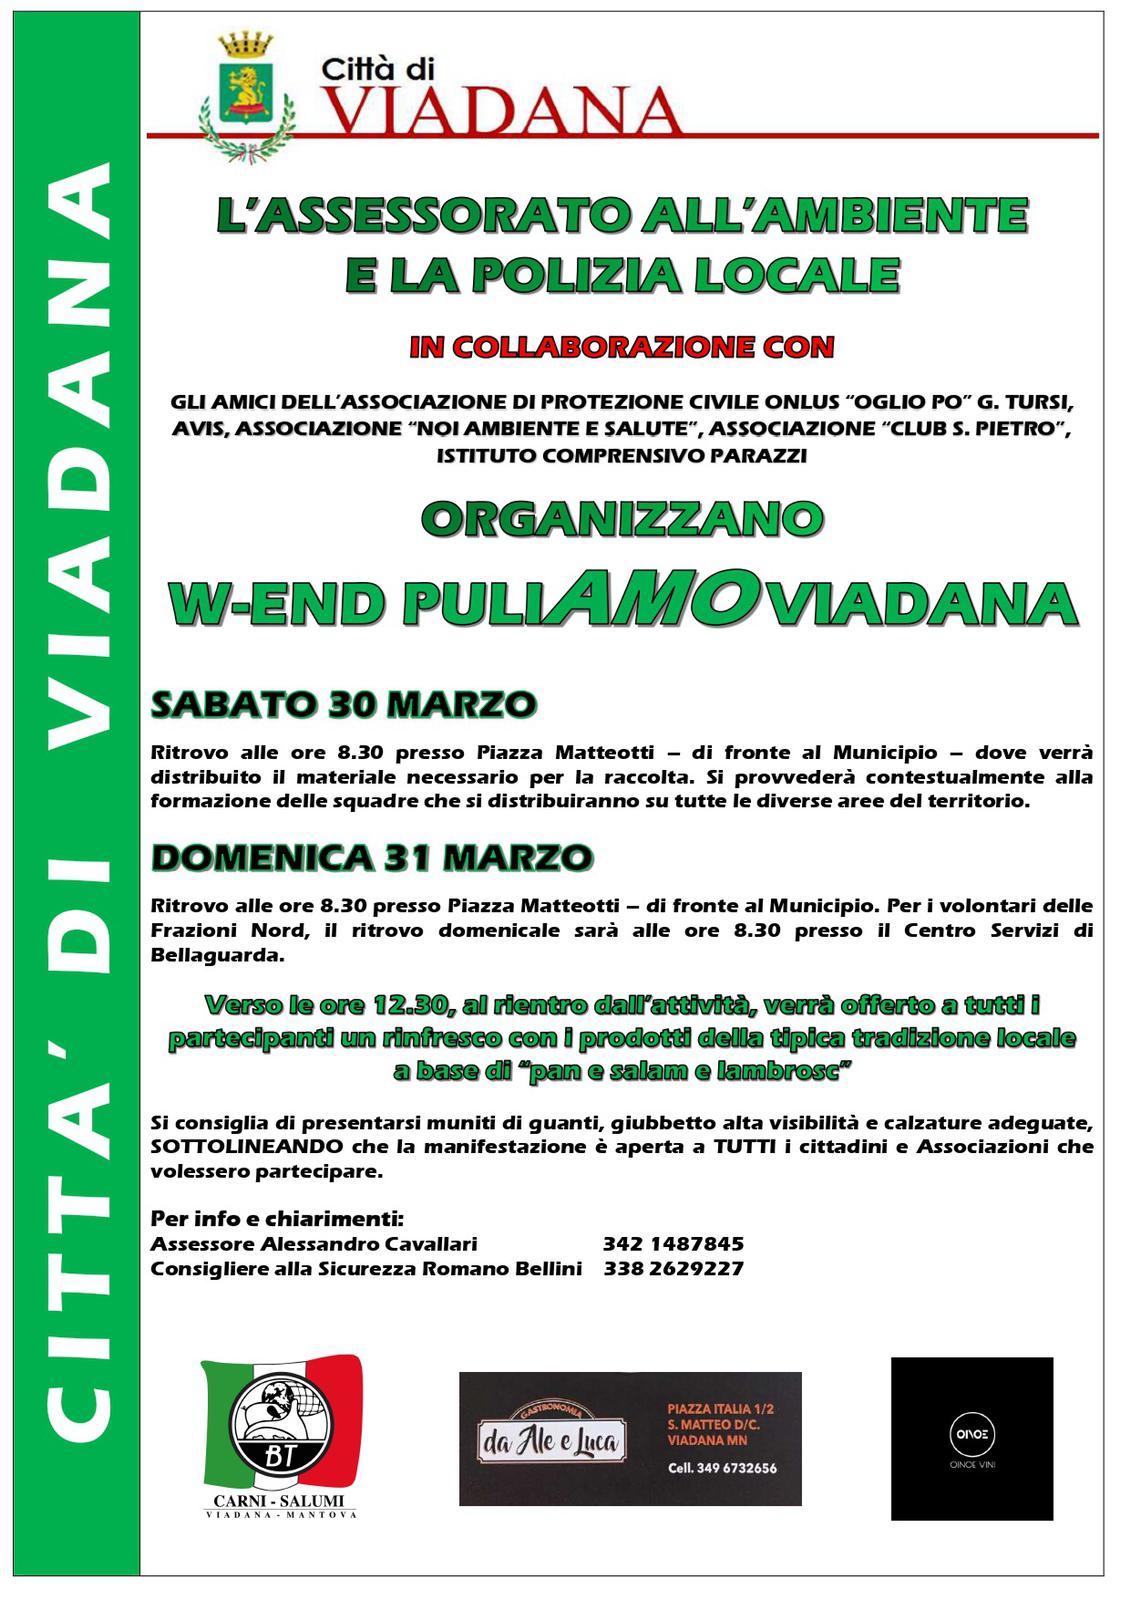 30/03/2019 - W-end puliAmo Viadana